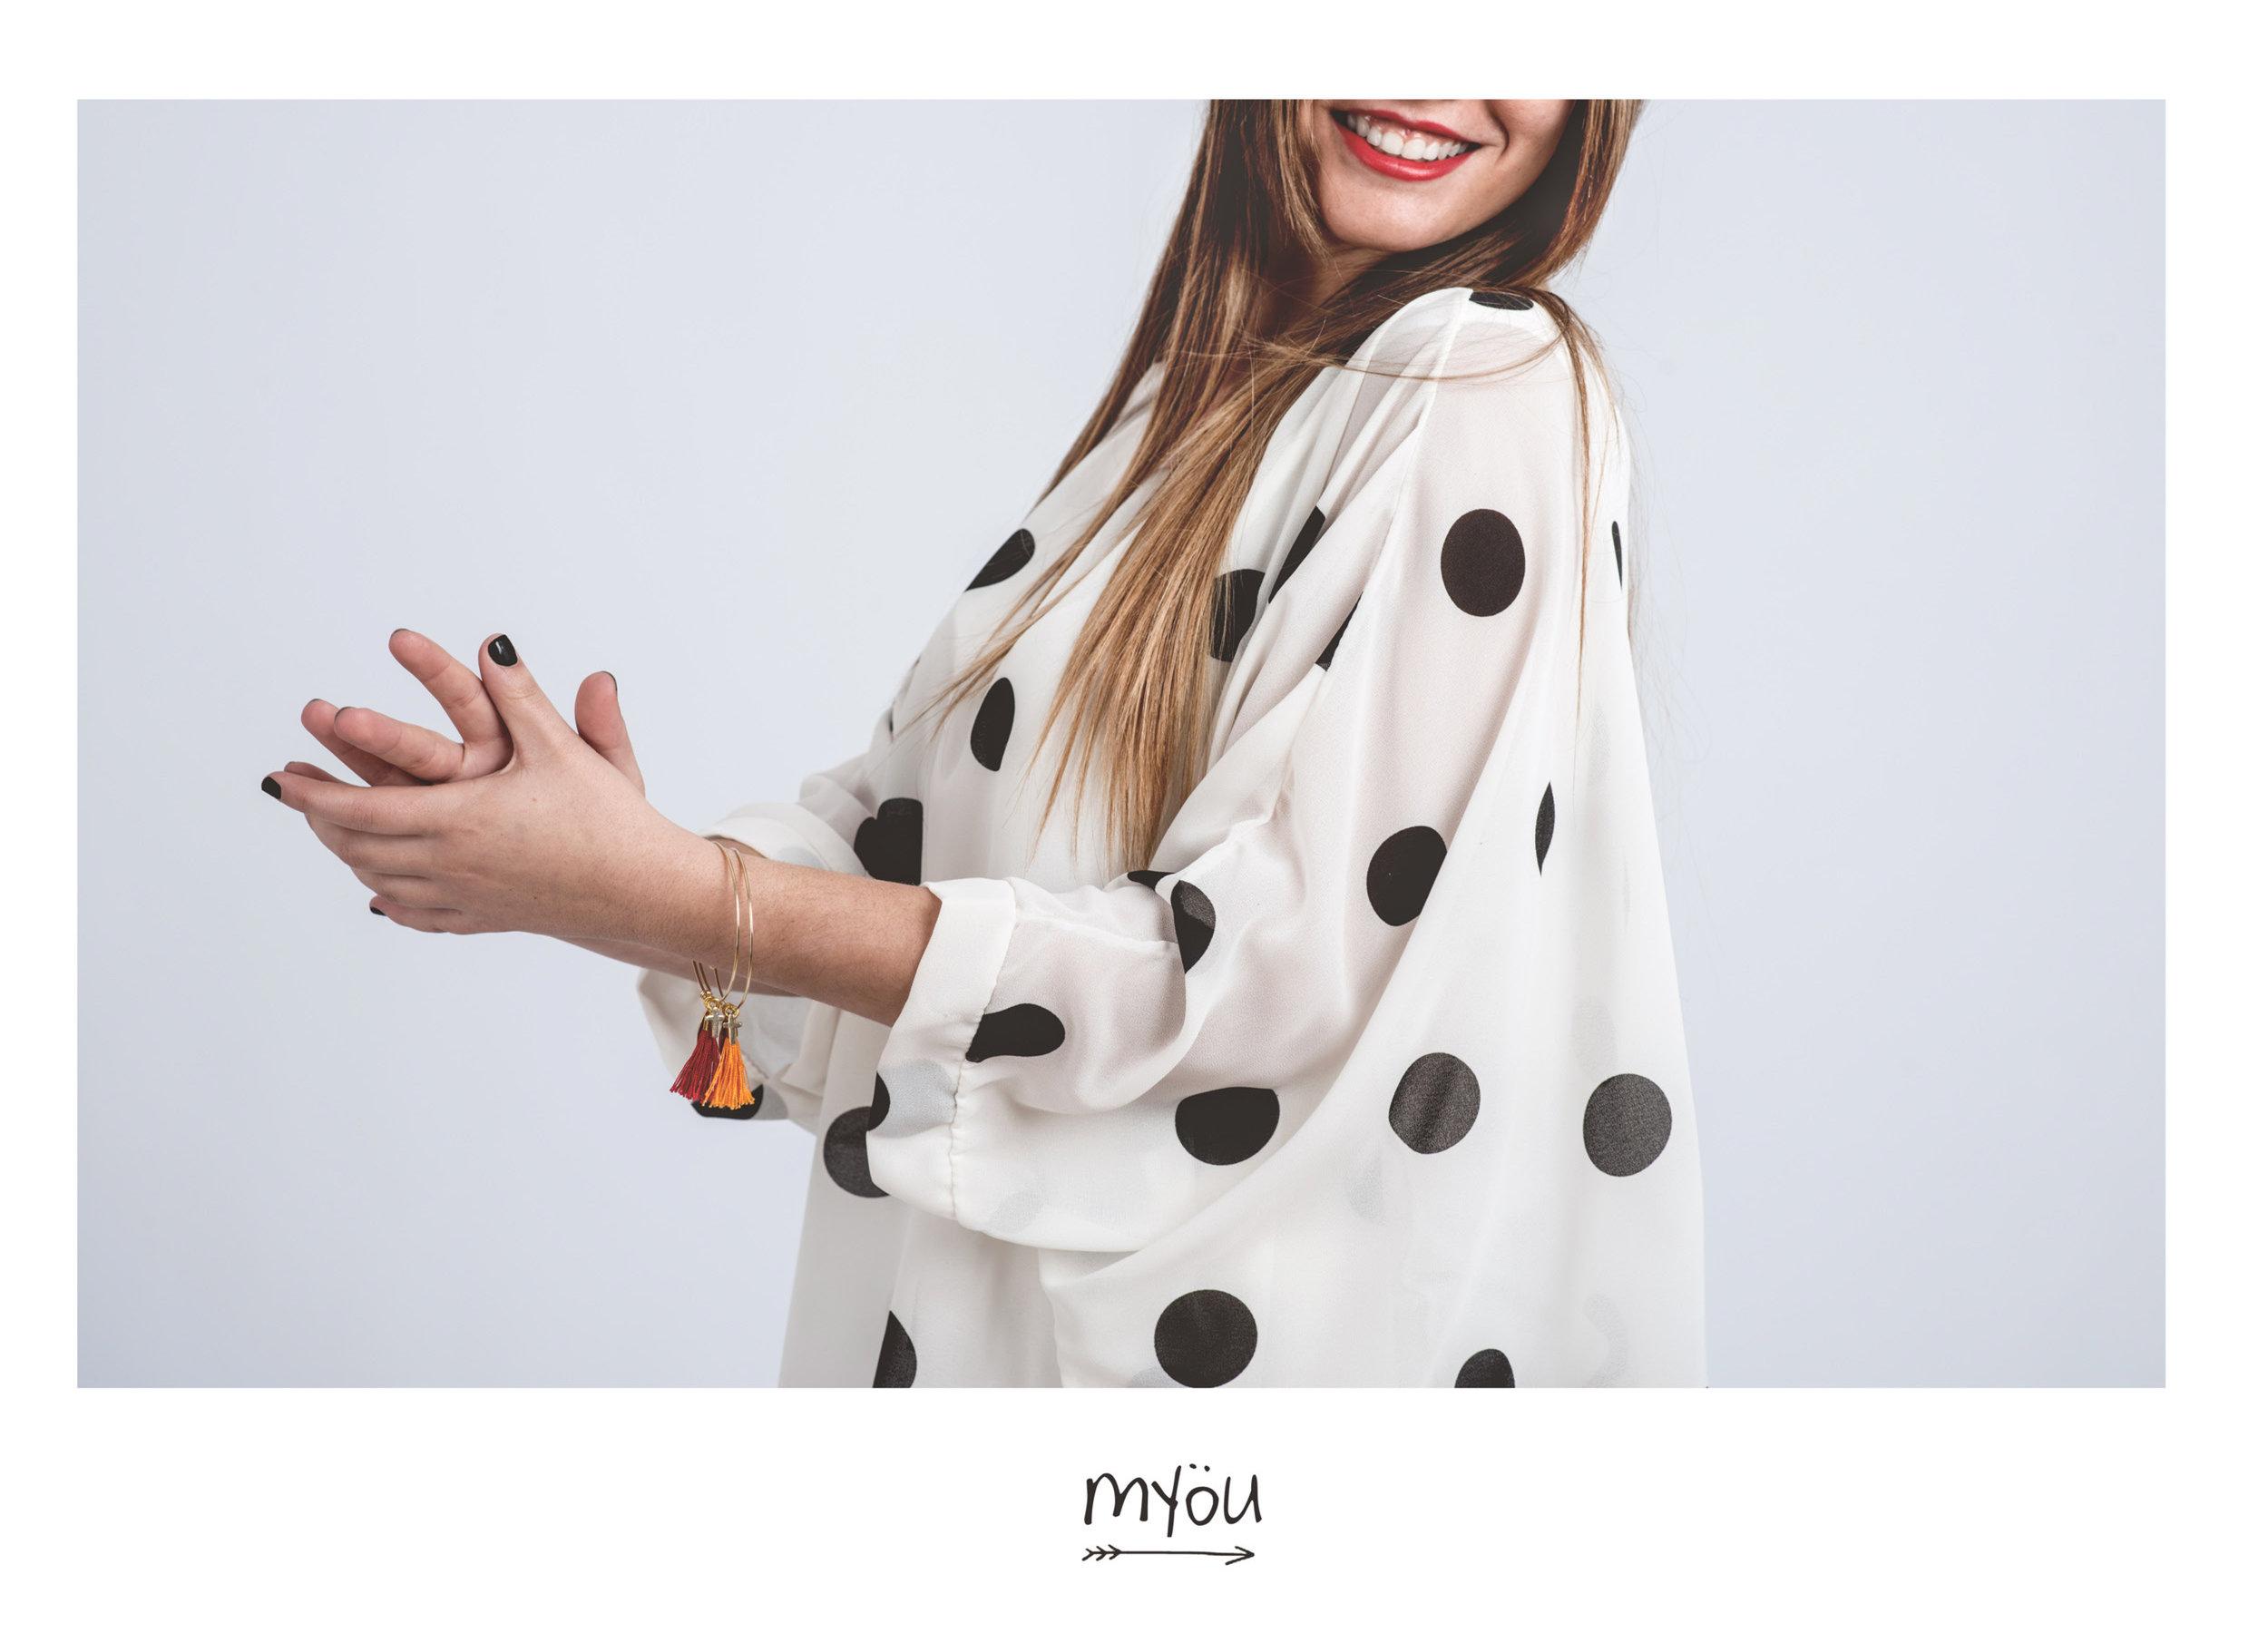 Myou2.jpg